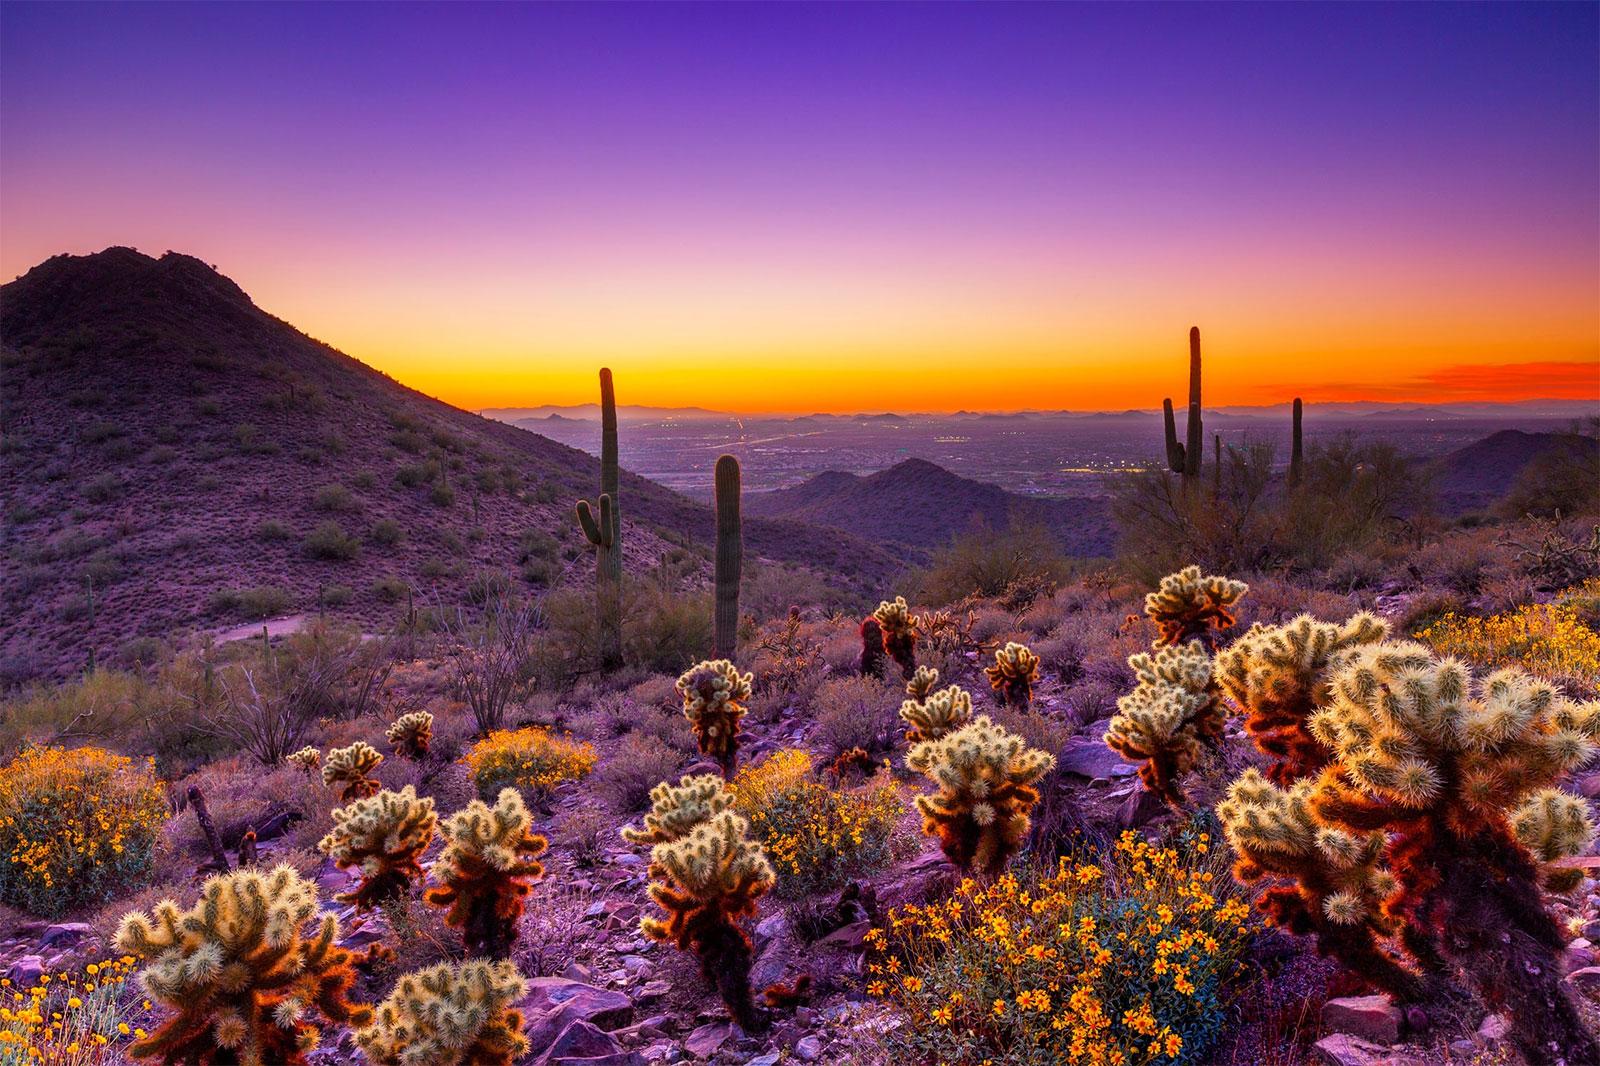 mcdowell-mountains-scottsdale-arizona.jpg